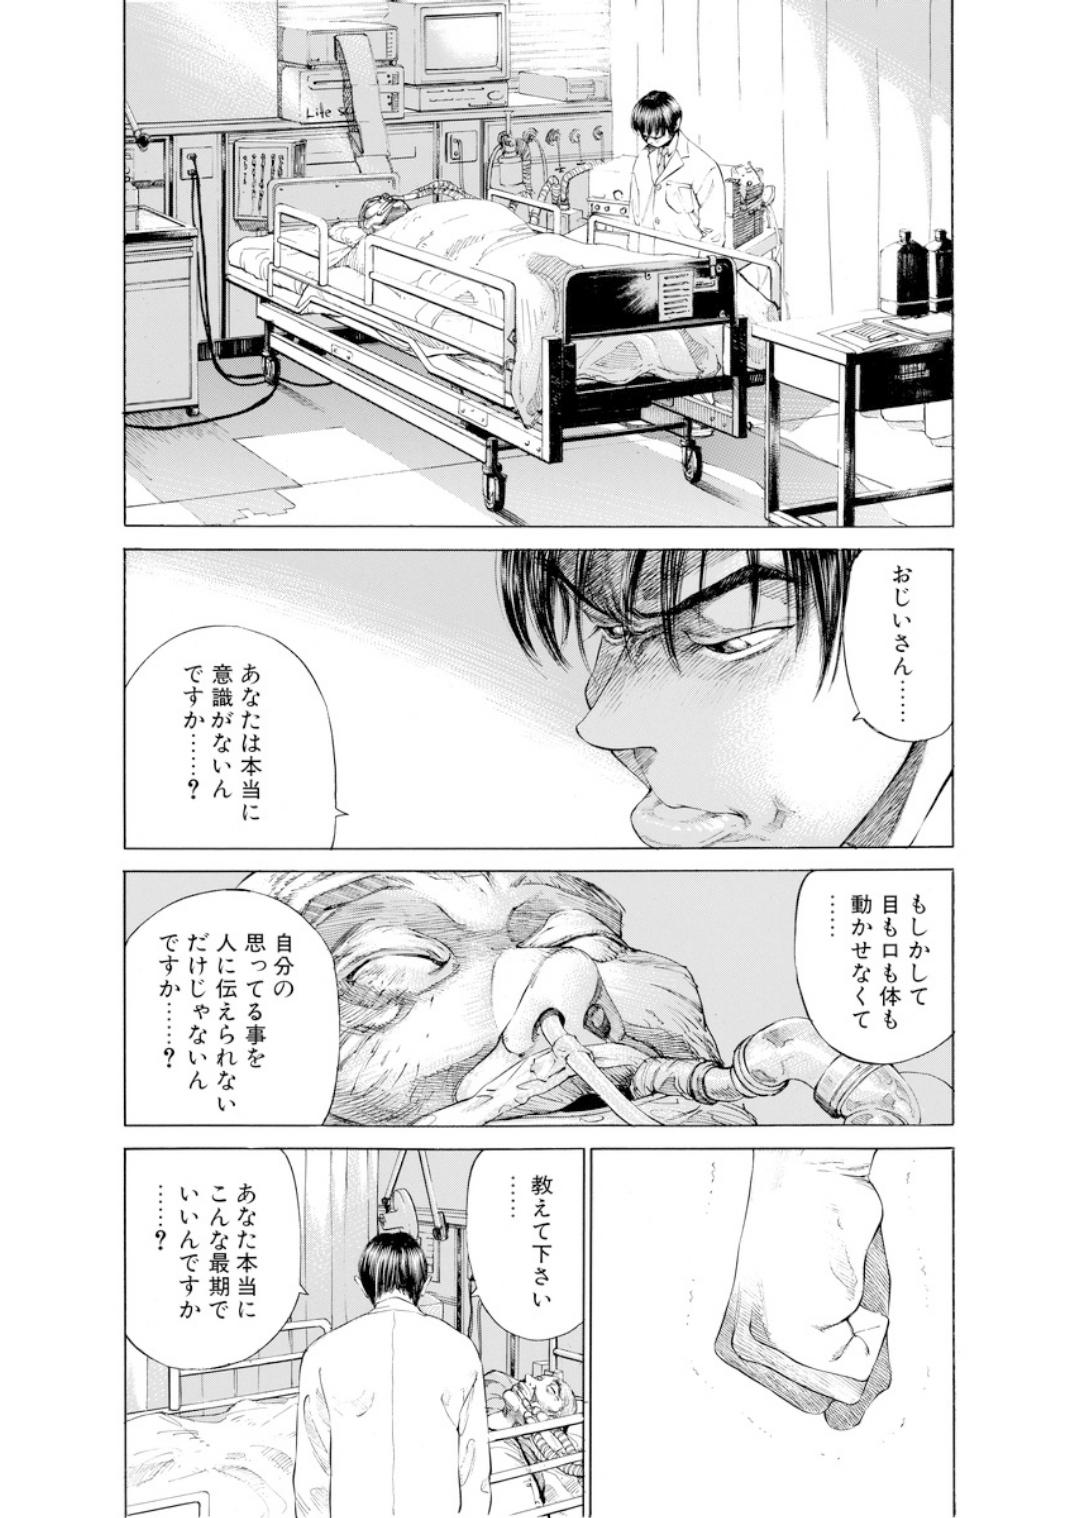 001bj_page-0117.jpg